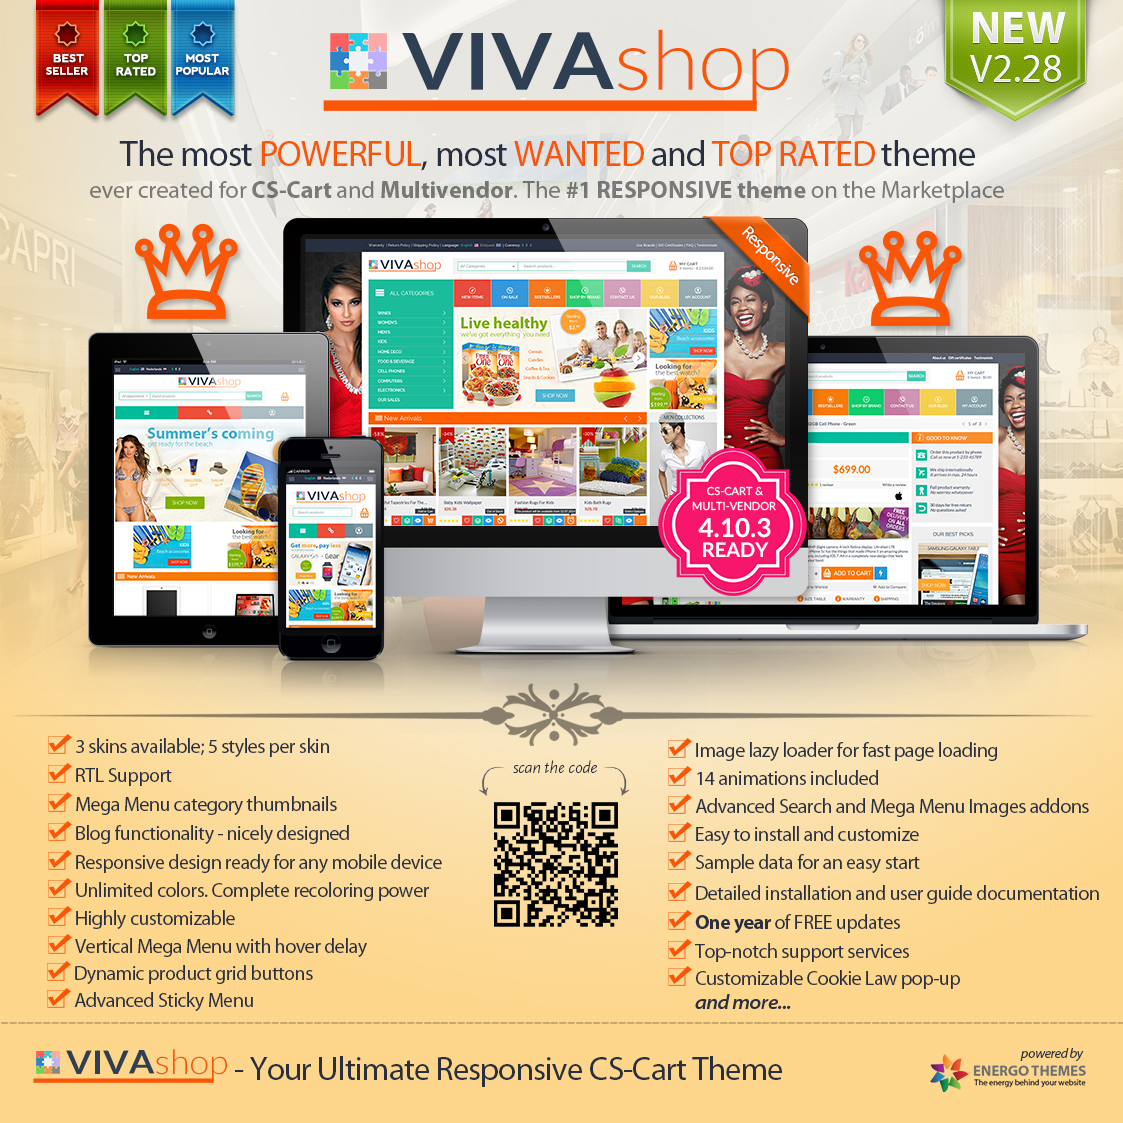 VIVAshop-V2.28-presentation-page-MP.jpg